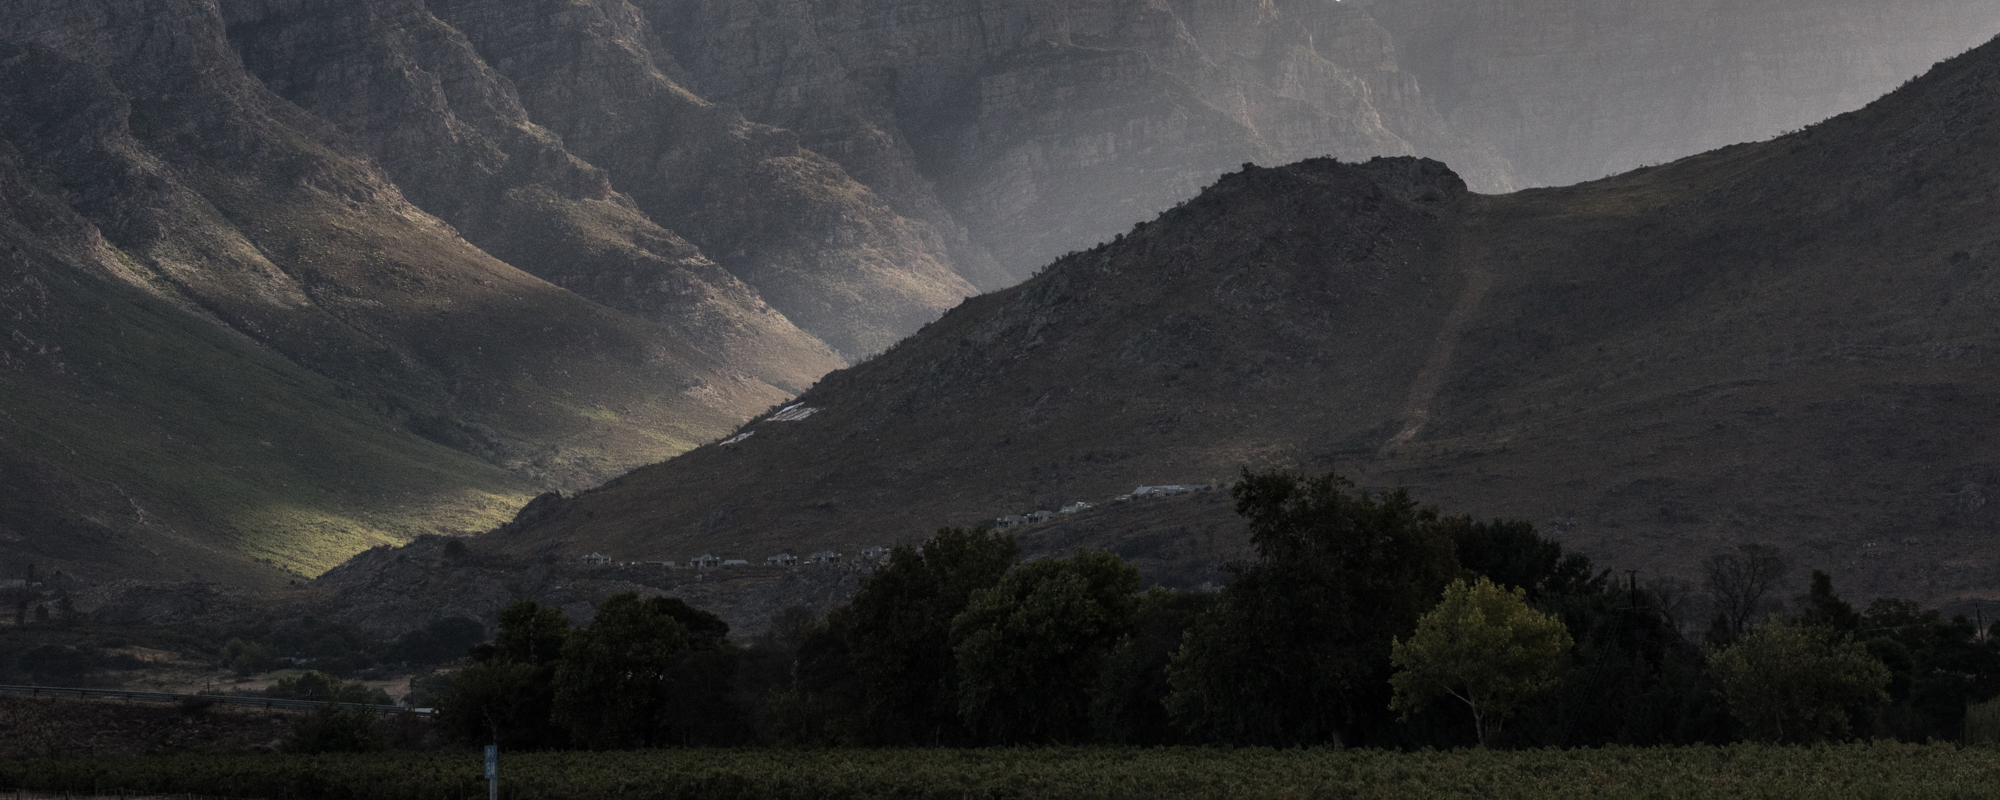 Henri Weyrich Photography Landscape - South Africa